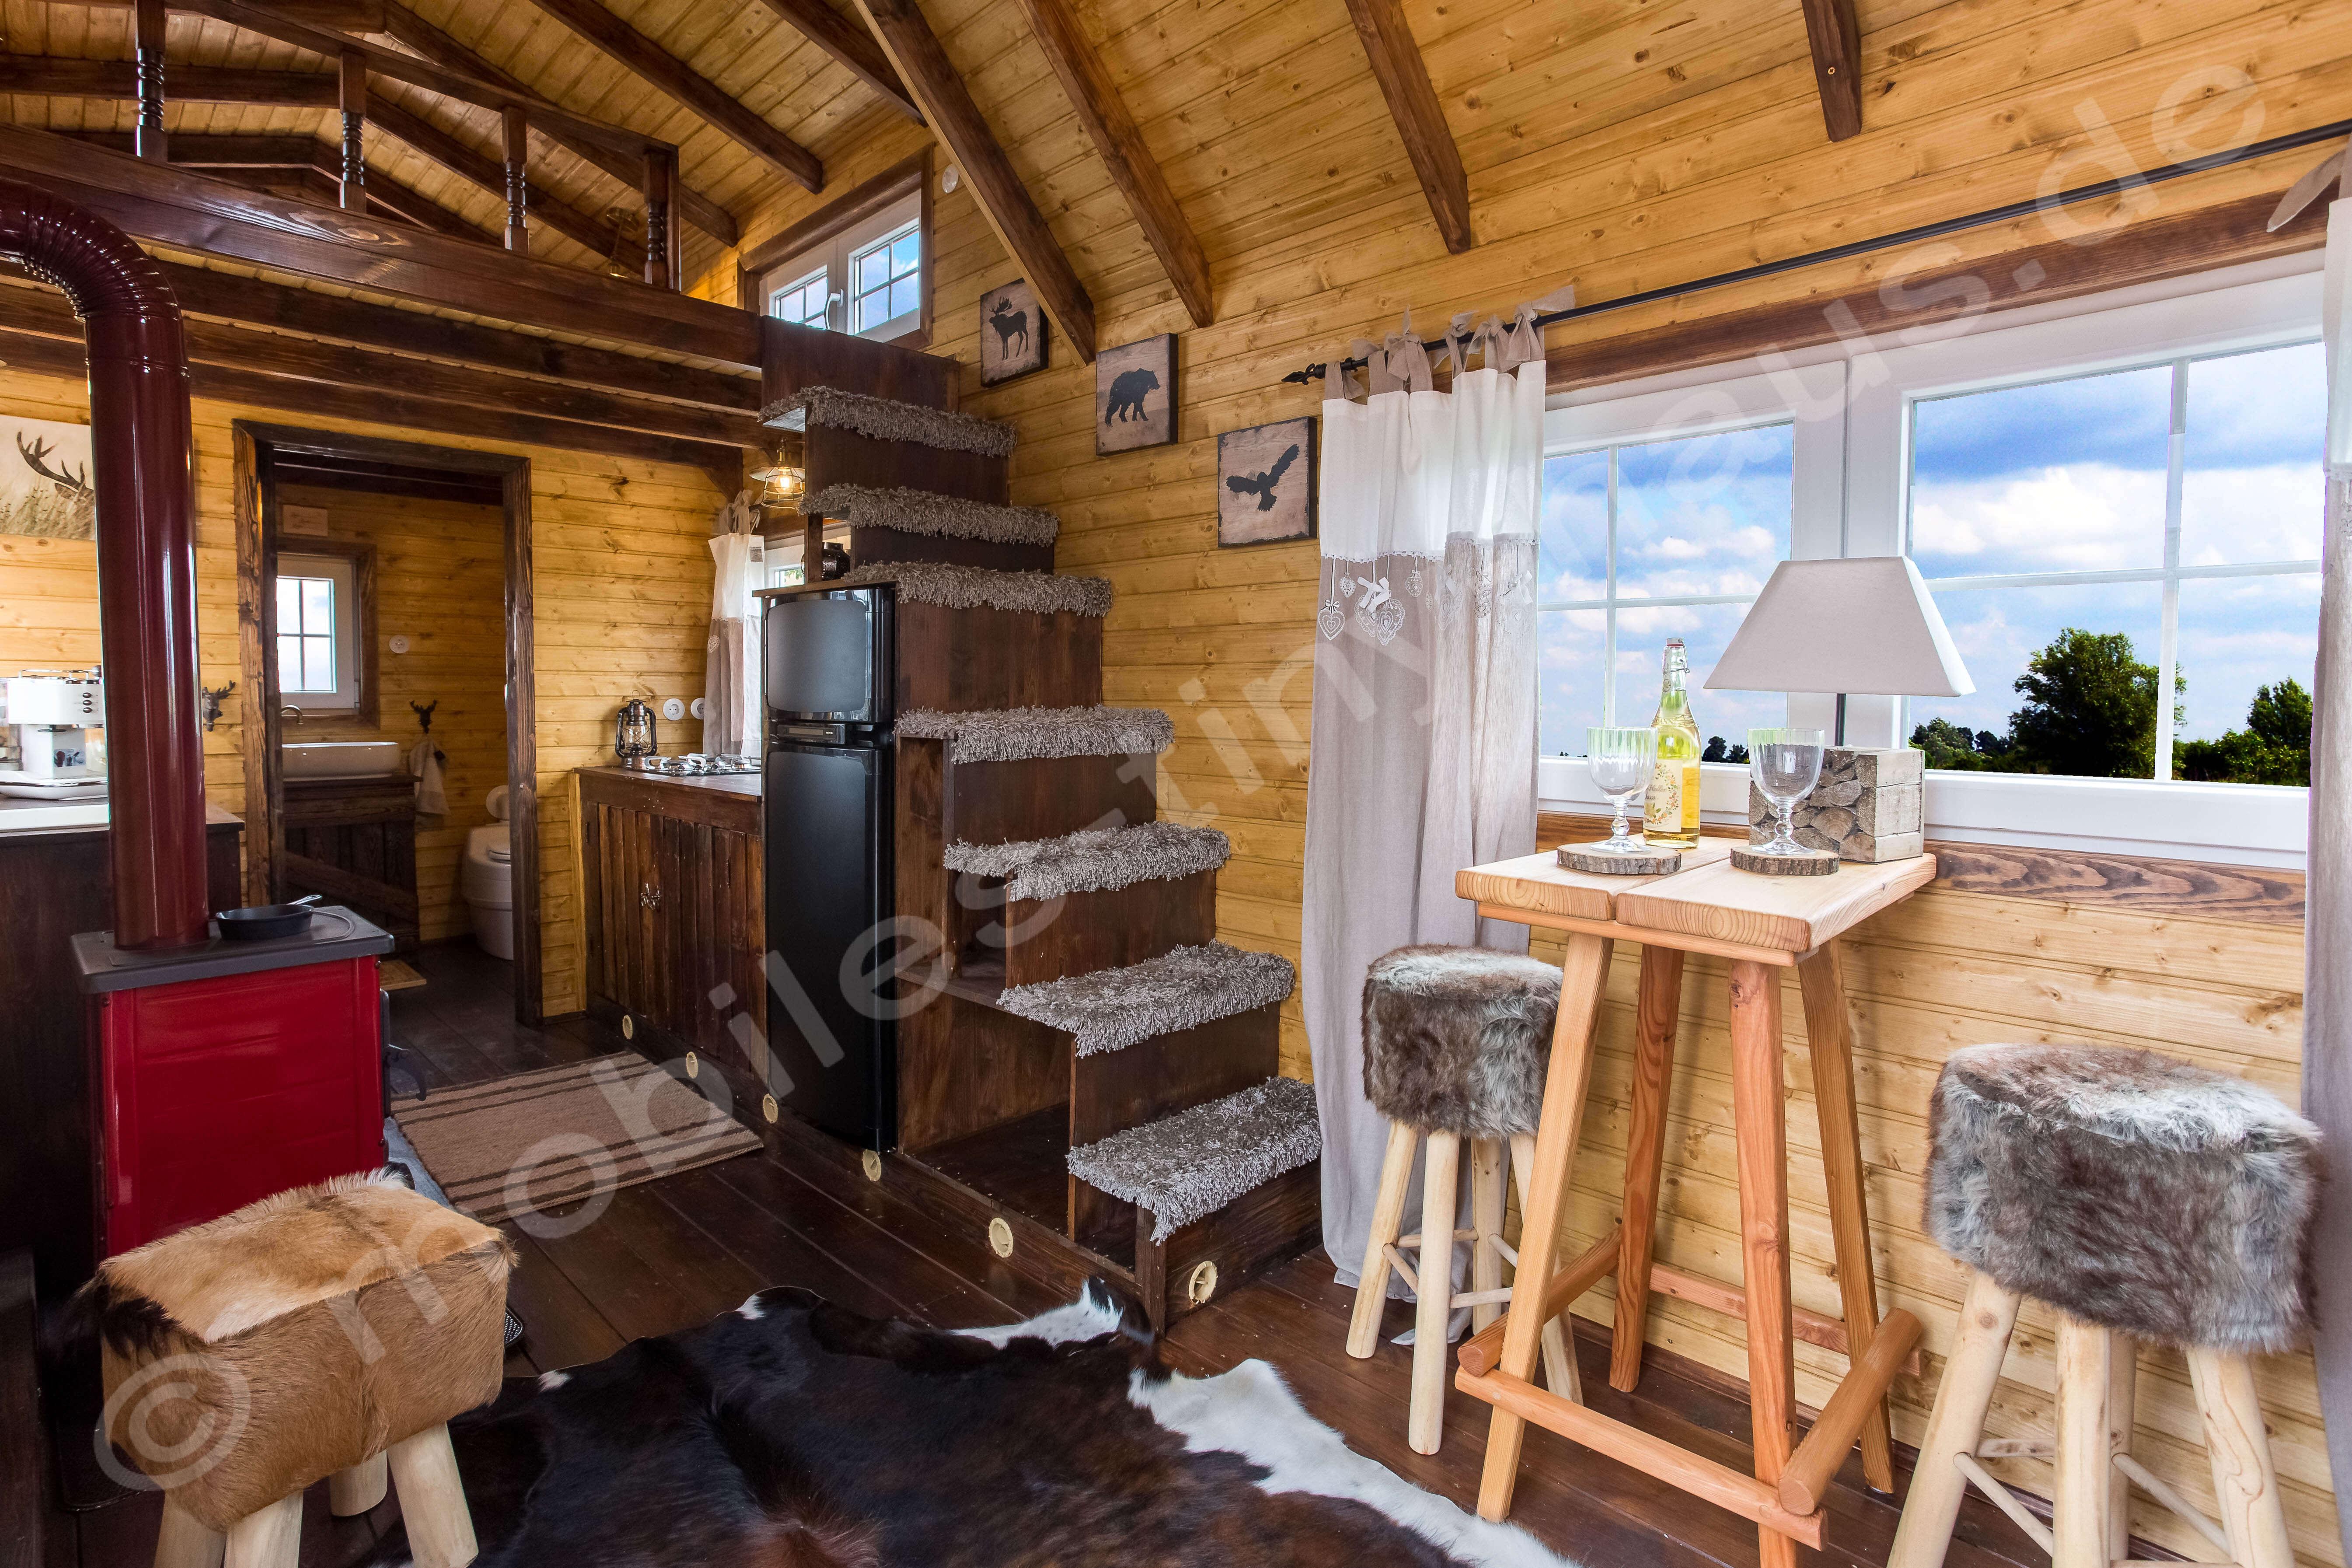 tiny house schweden mobiles tiny haus. Black Bedroom Furniture Sets. Home Design Ideas